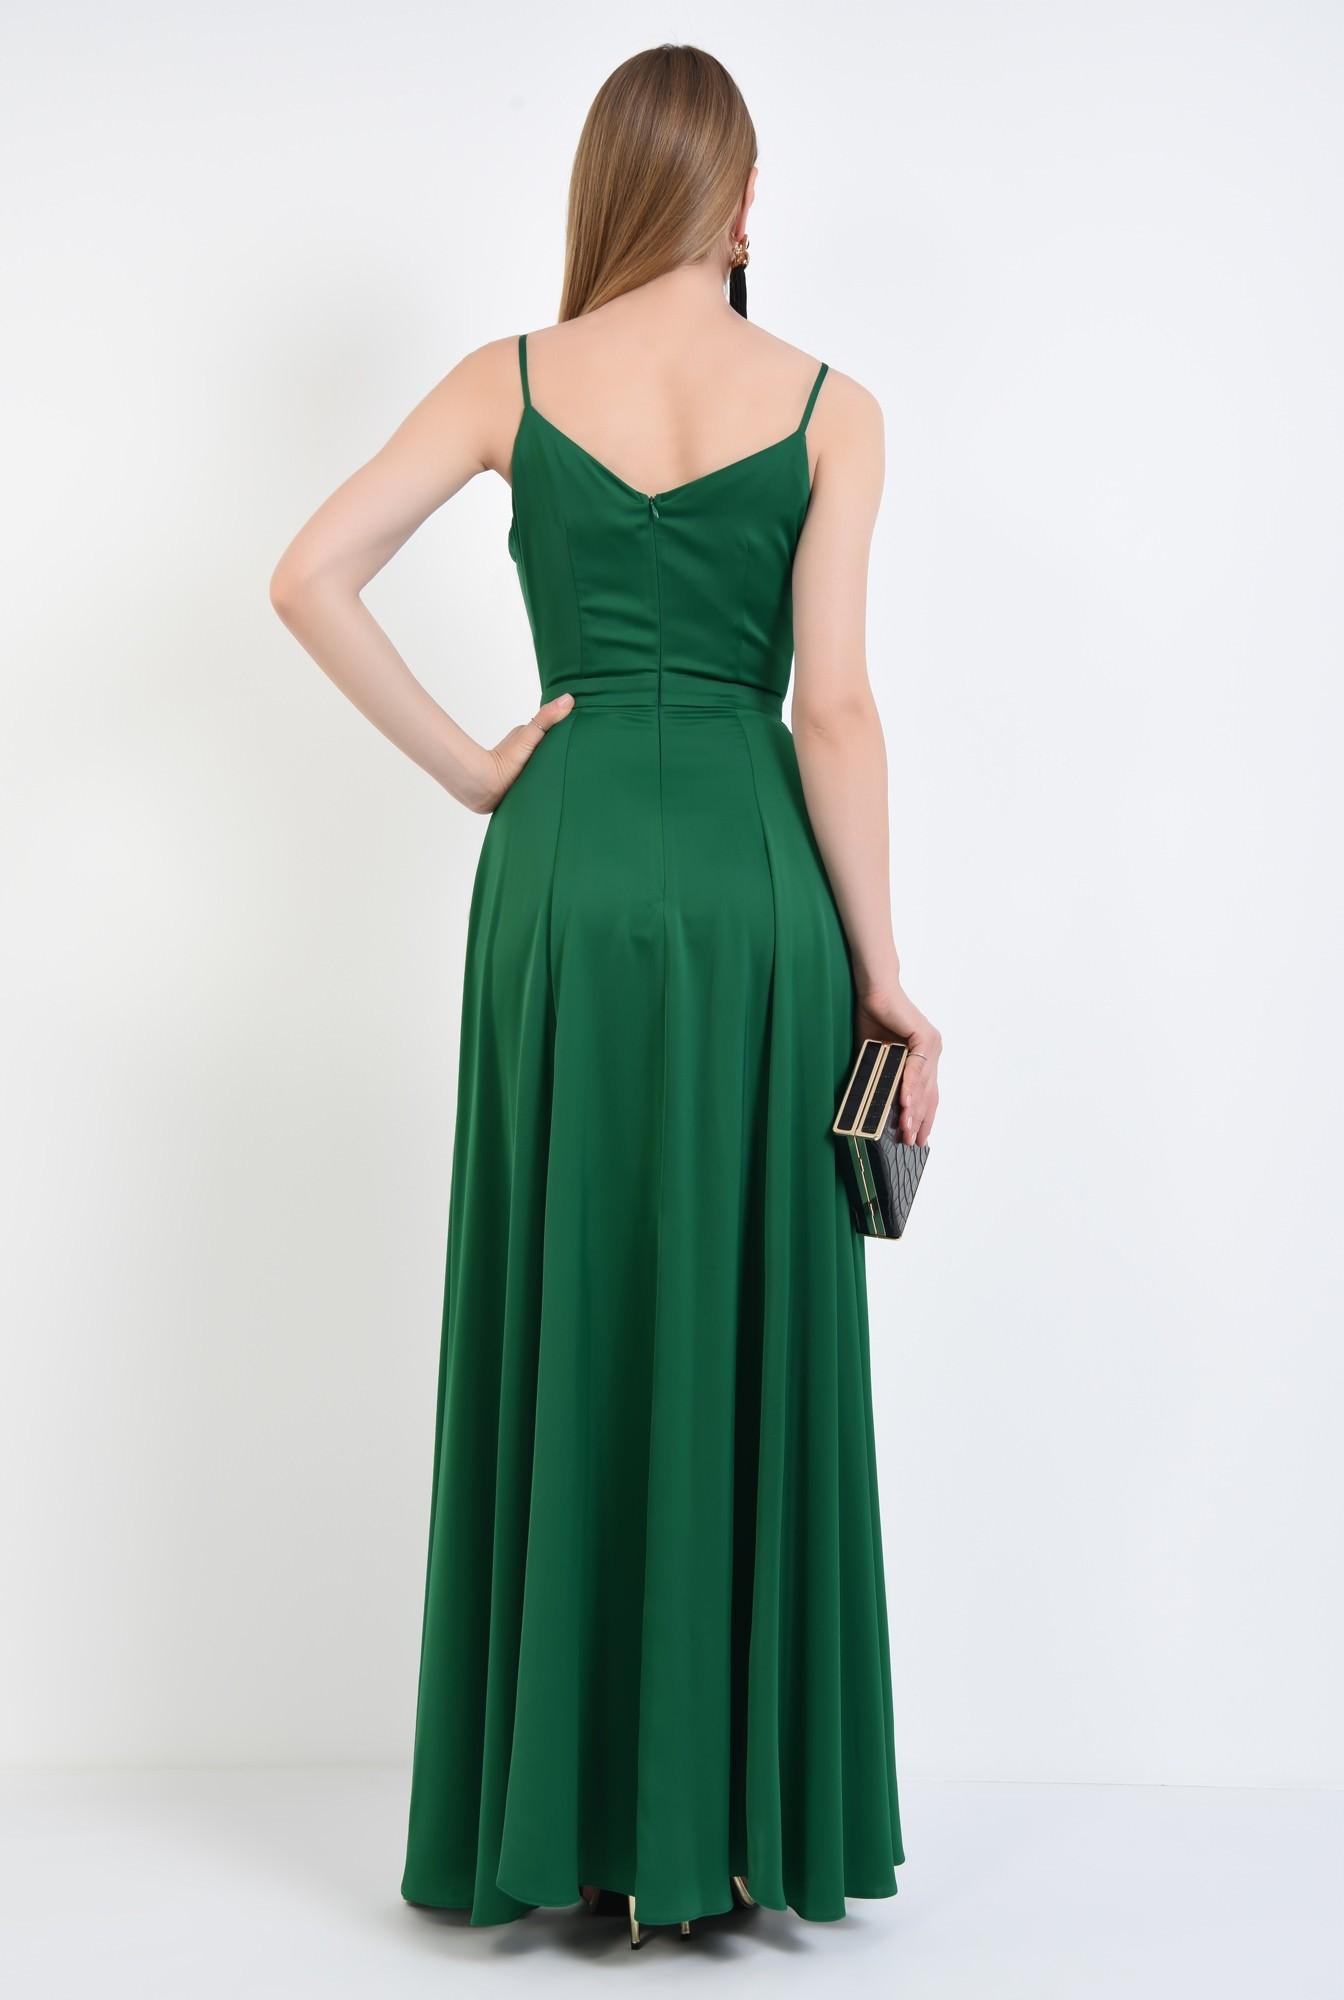 1 - rochie de seara, slit adanc, verde, smarald, bretele subtiri